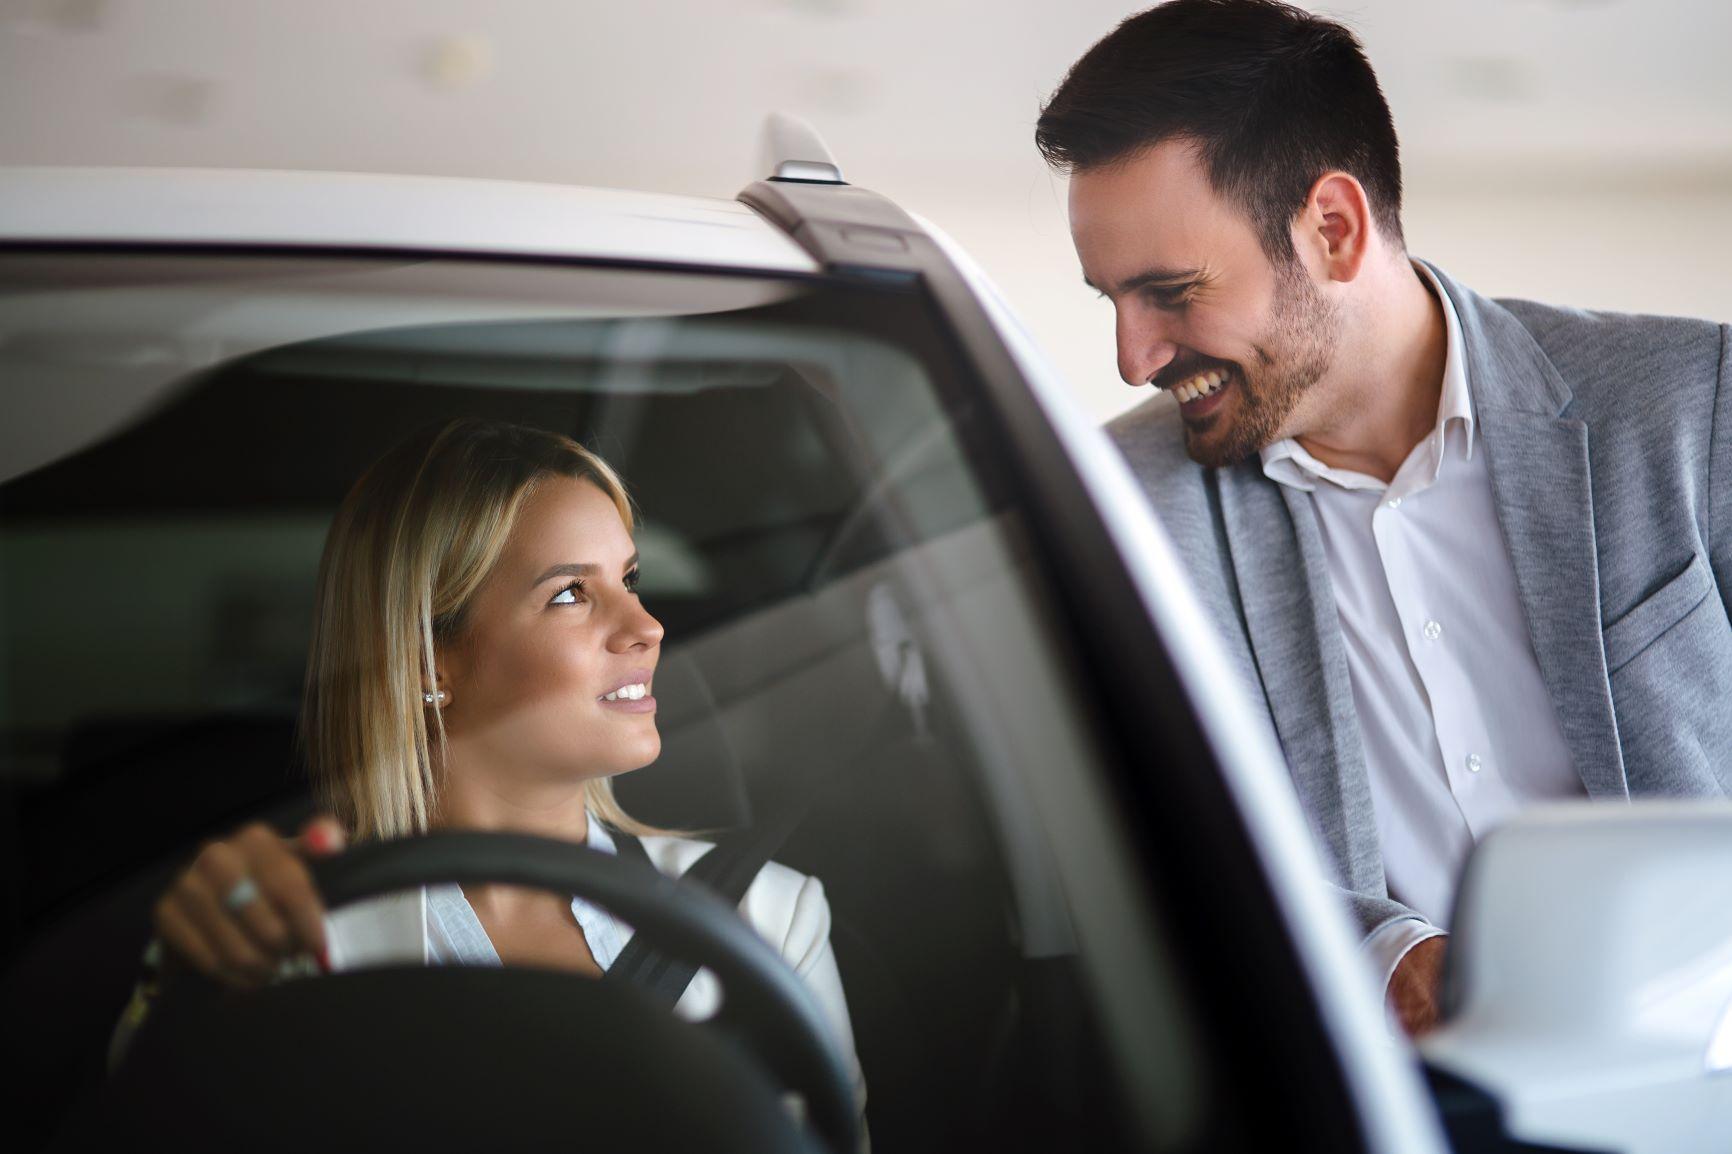 car salesman talking to blonde woman in car